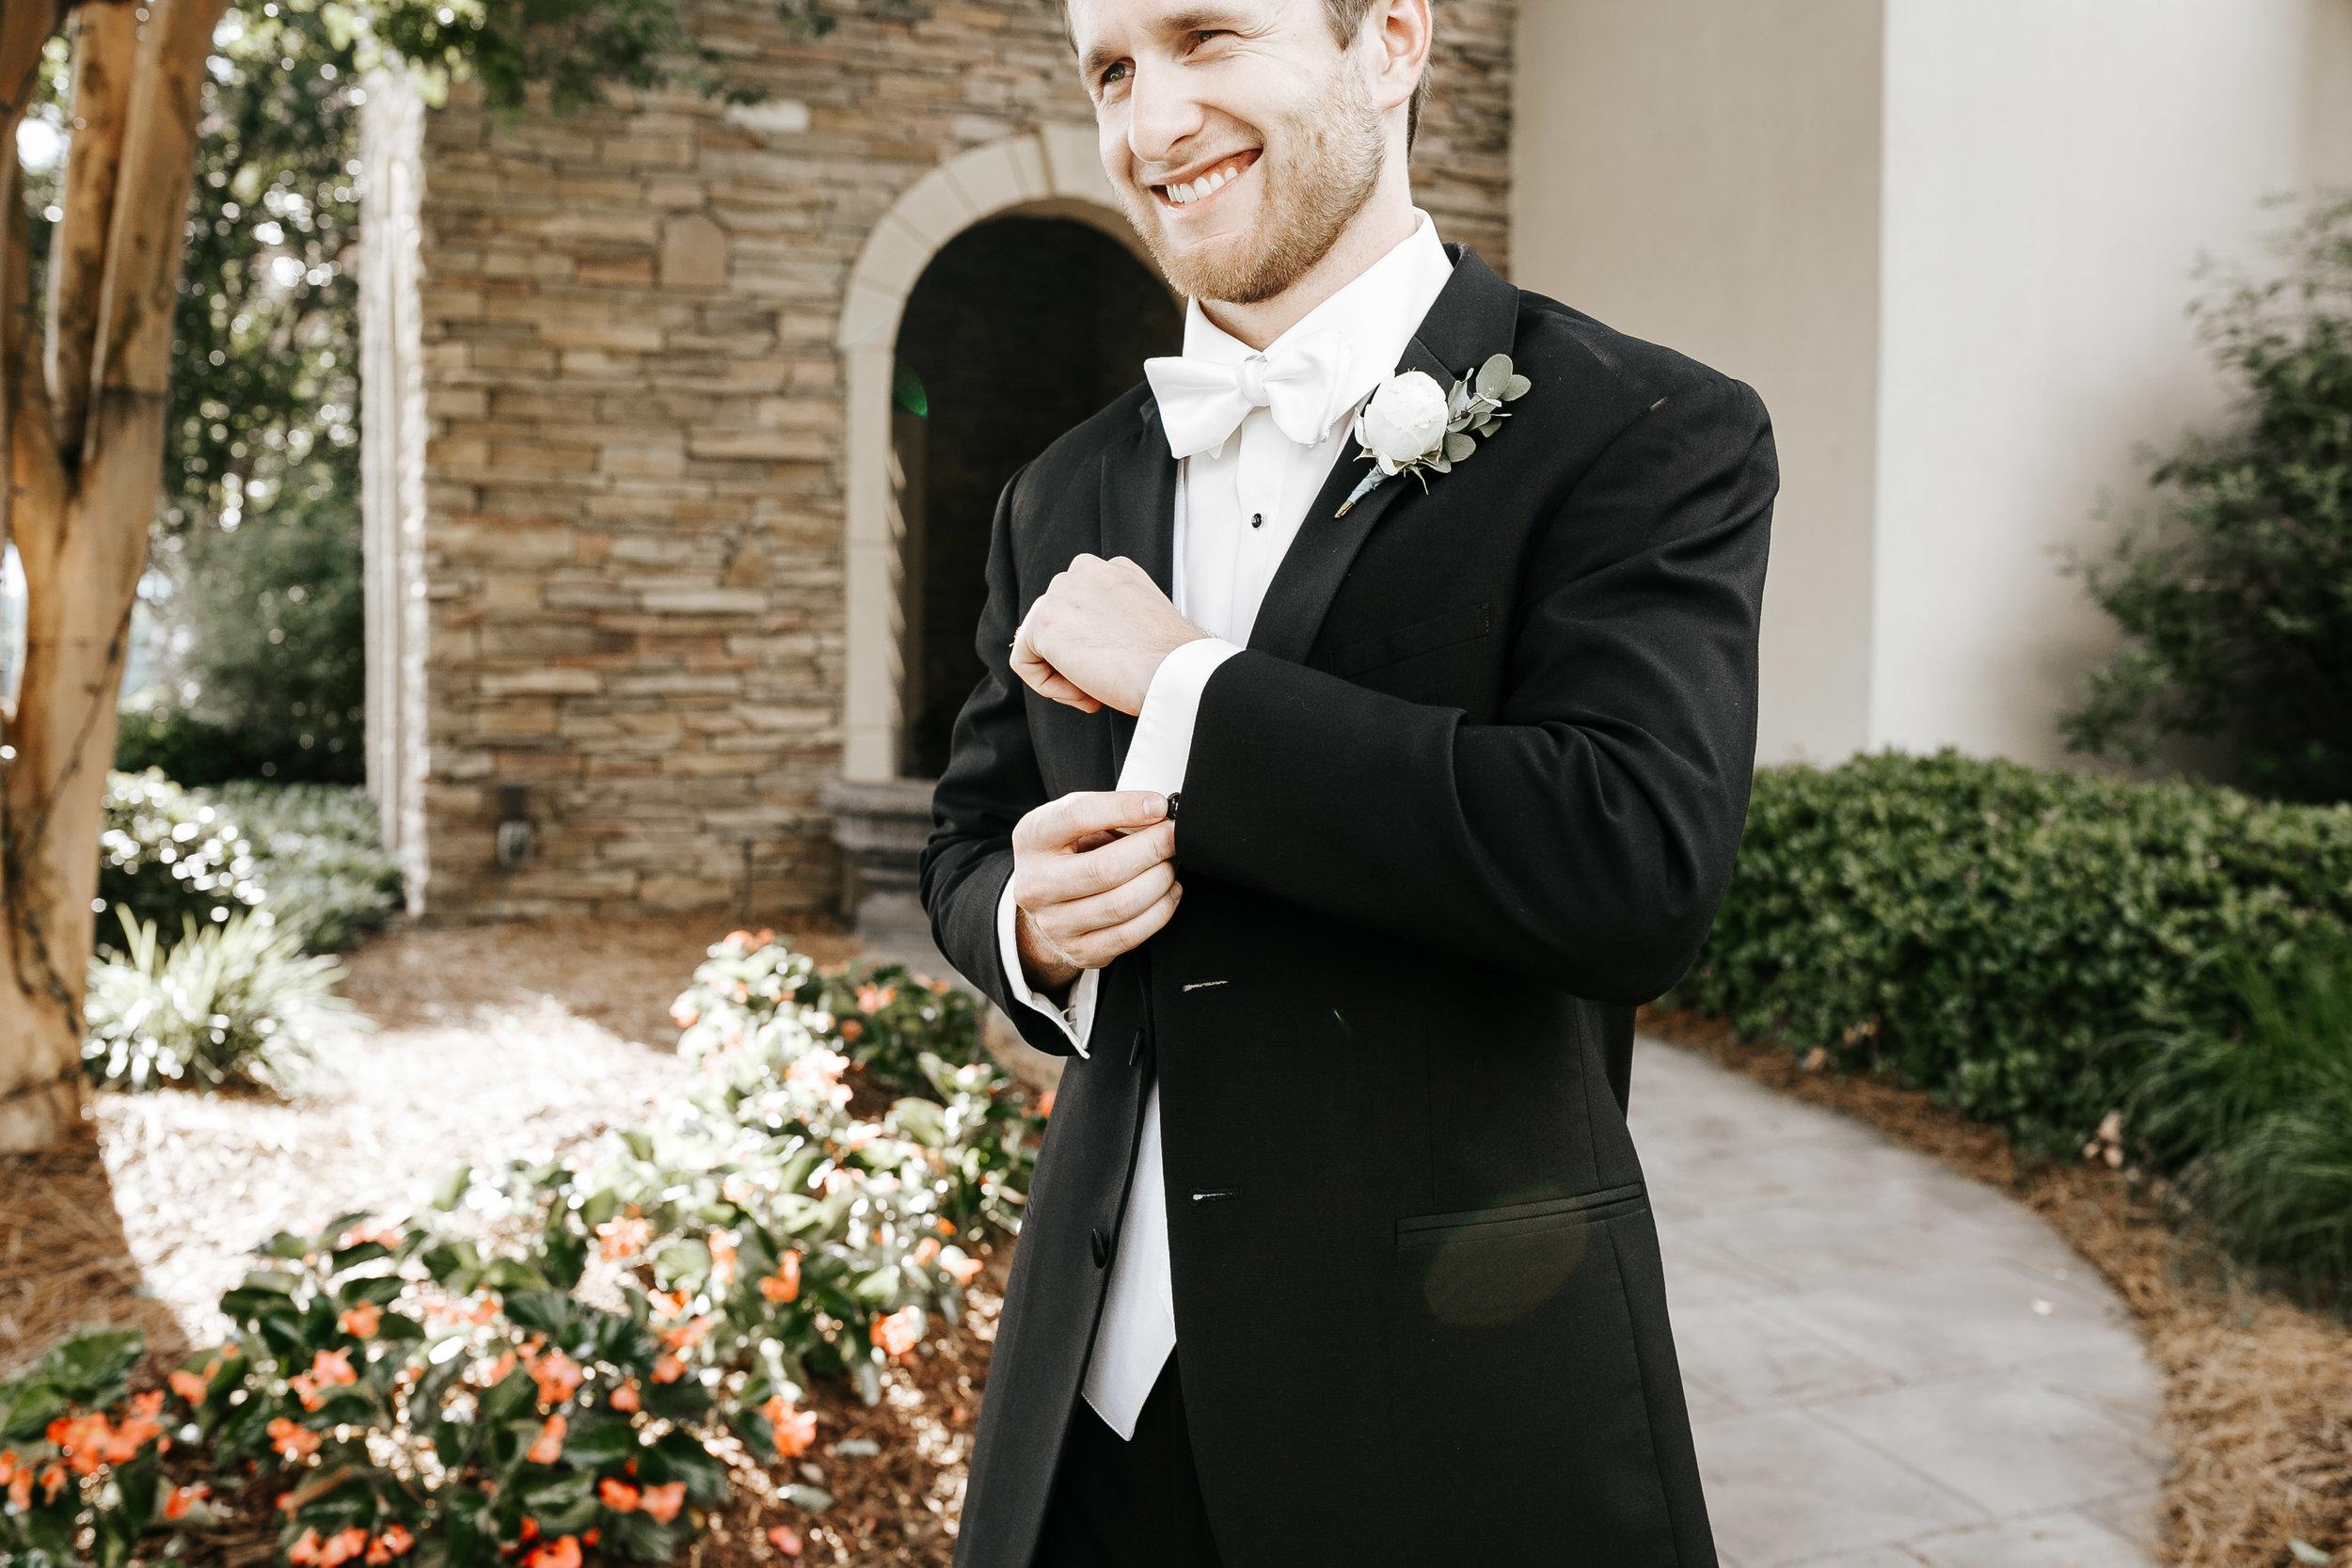 Bohemian-Wedding-Elopement-Photographer-Carolina-25.jpg